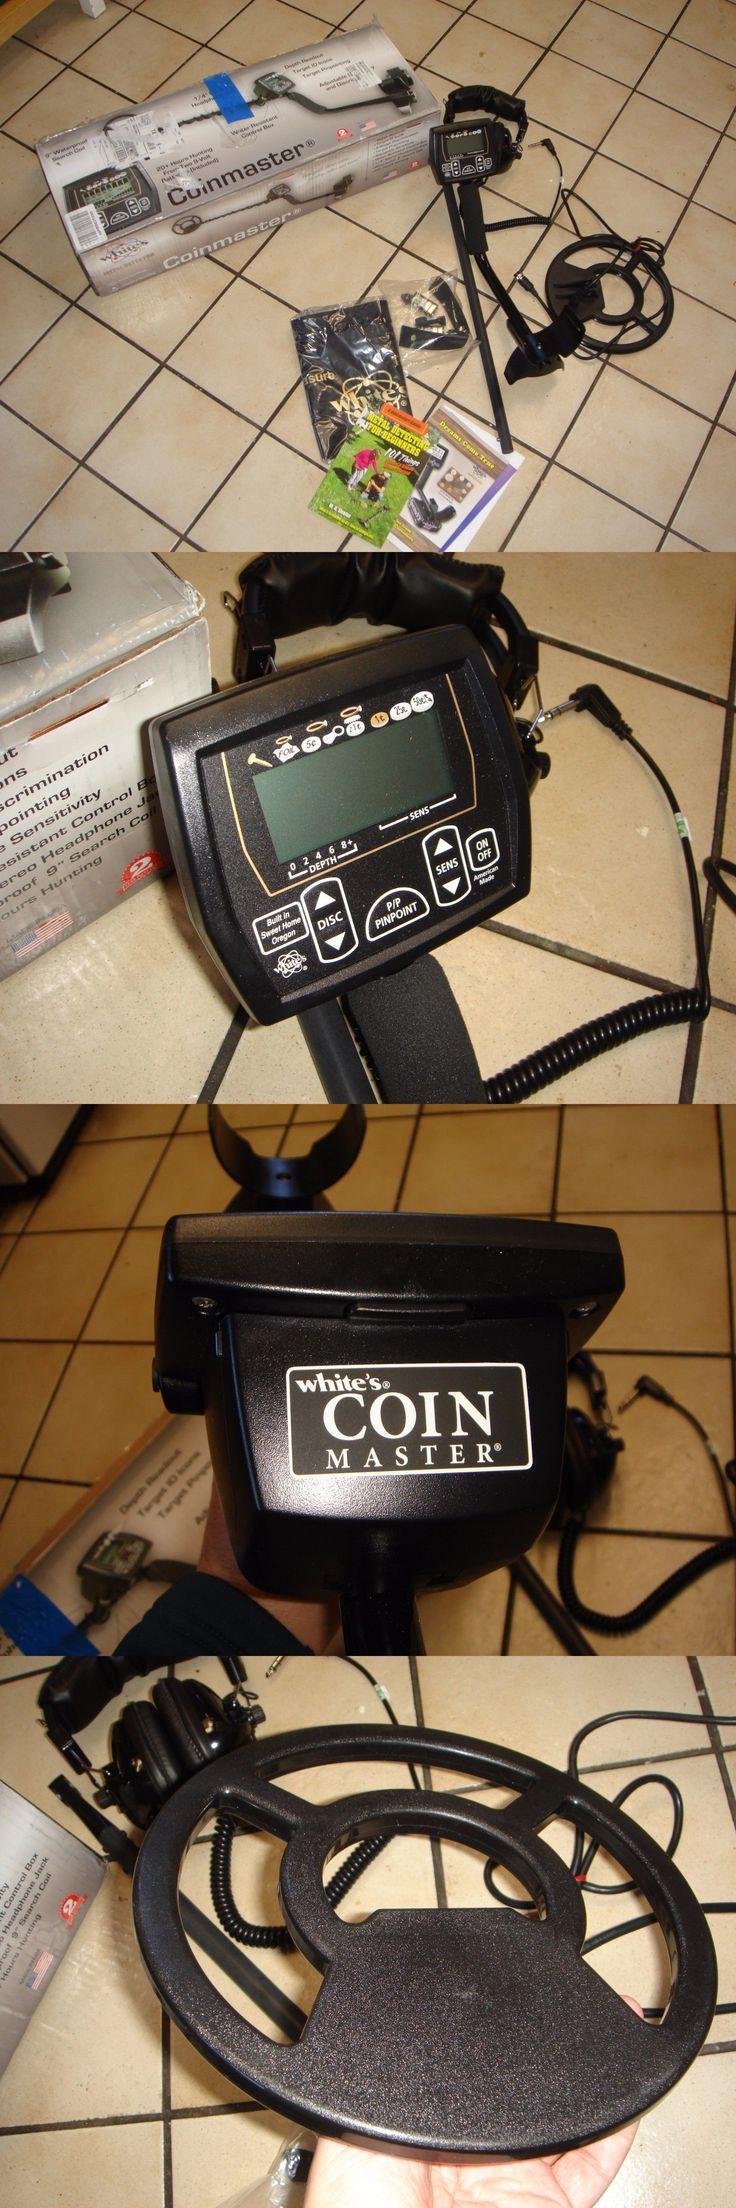 Metal Detectors: Whites Coinmaster Metal Detector 800-0325 Nib Open Box Return BUY IT NOW ONLY: $135.0